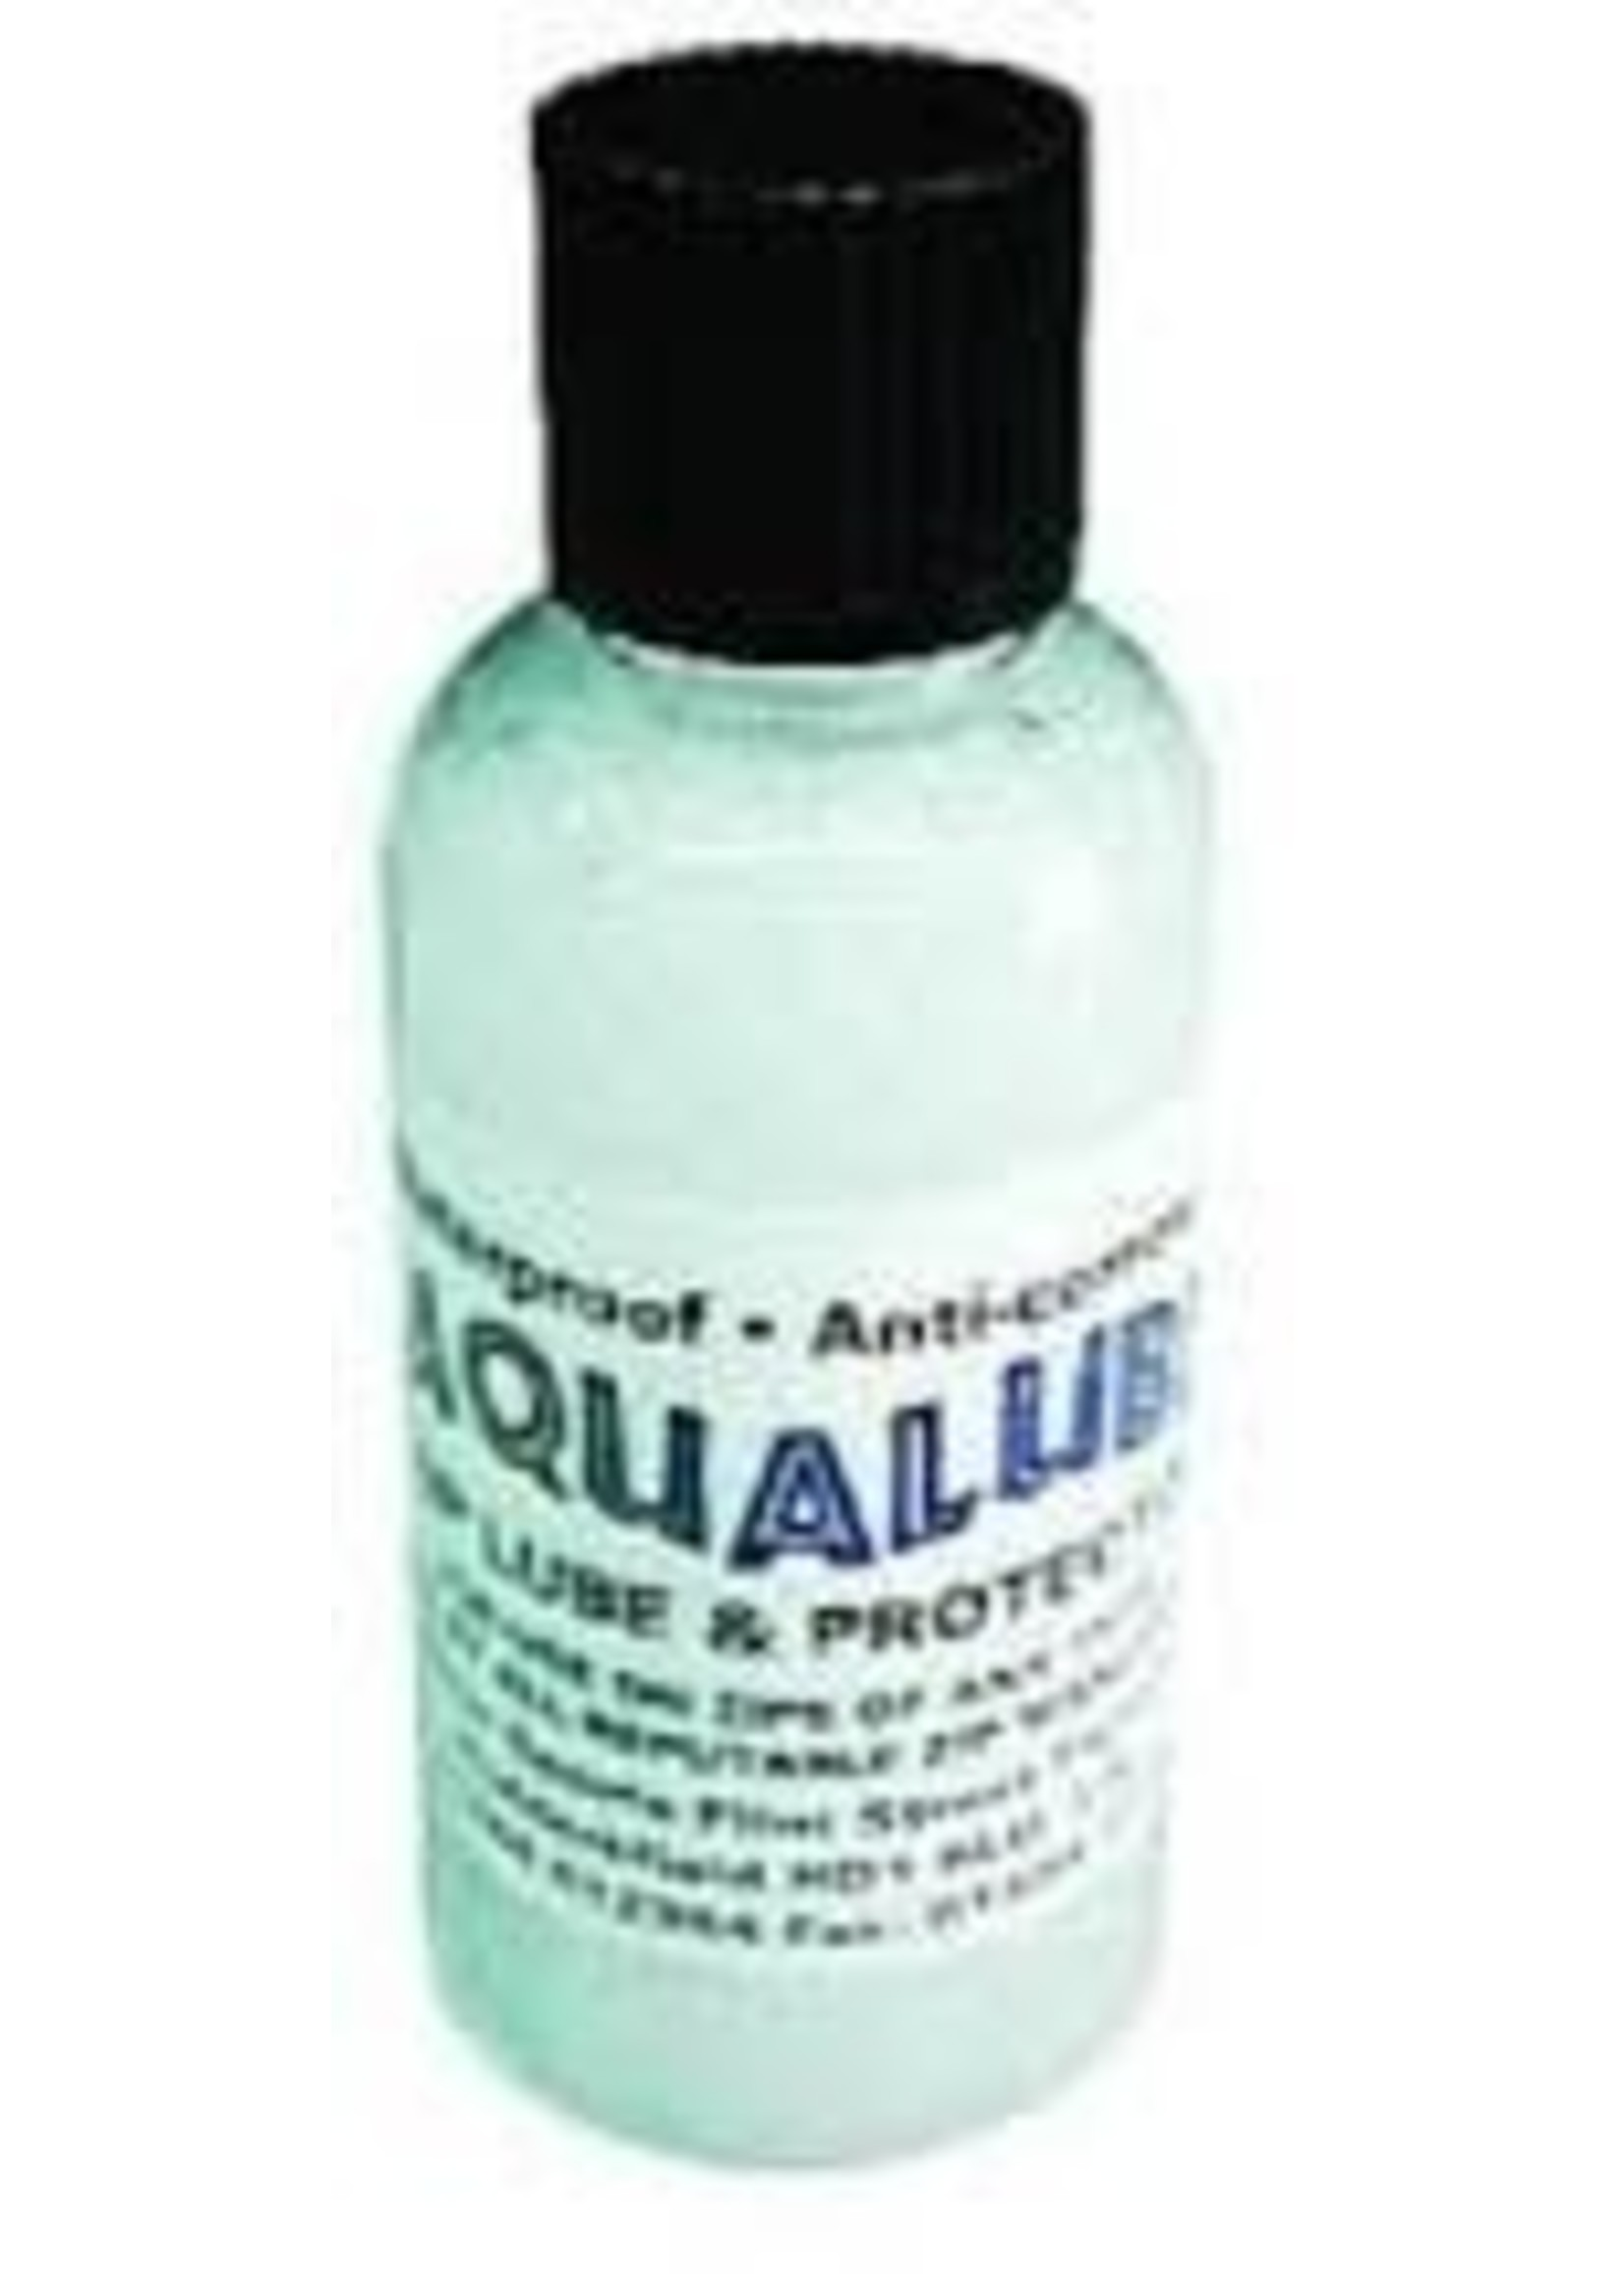 Aqualube